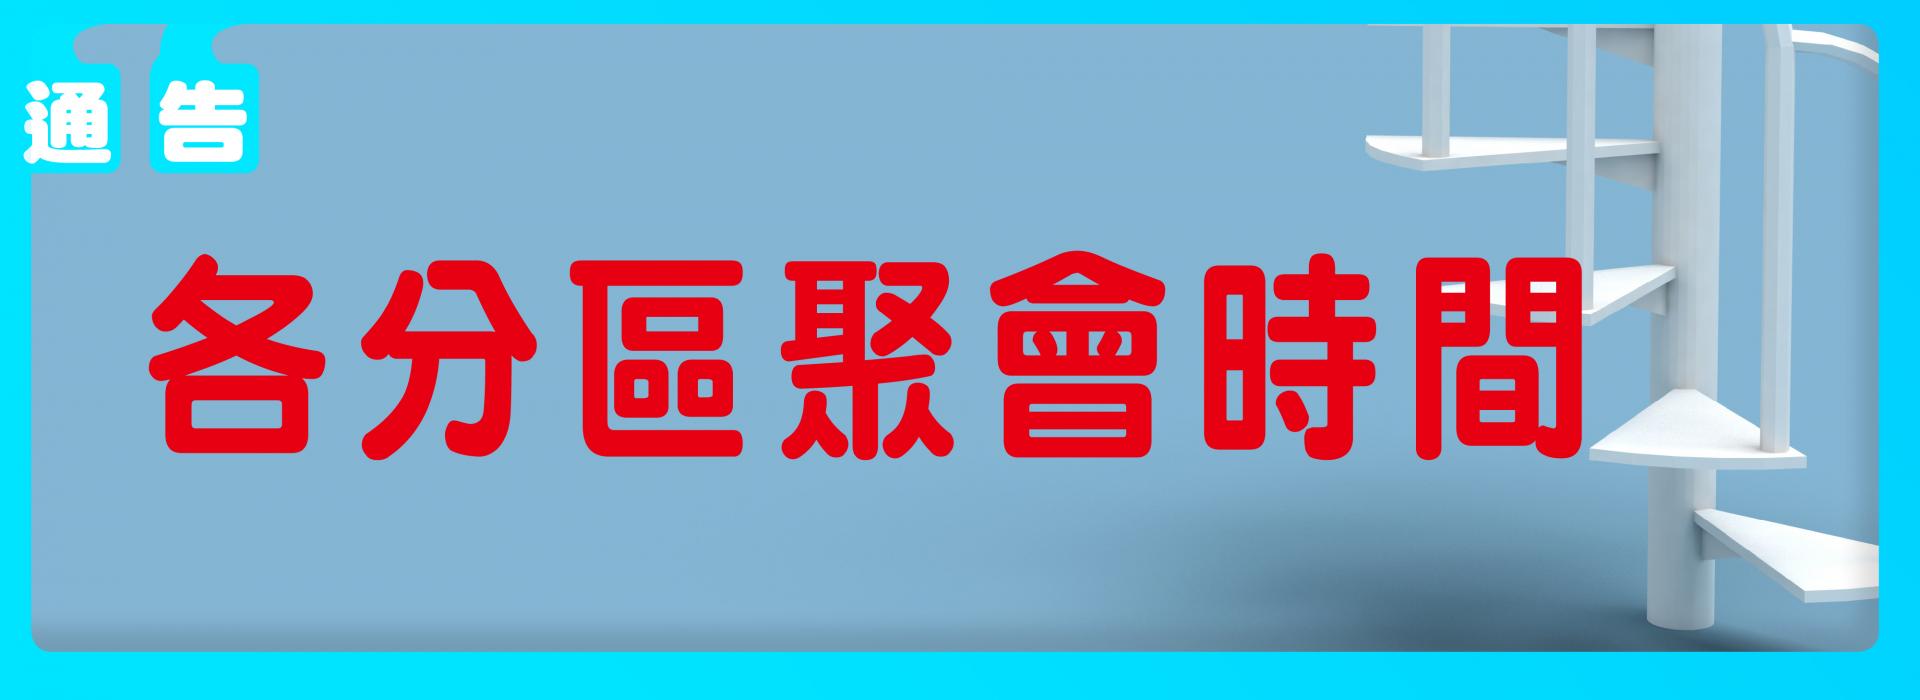 20210410NewNotice Banner-01